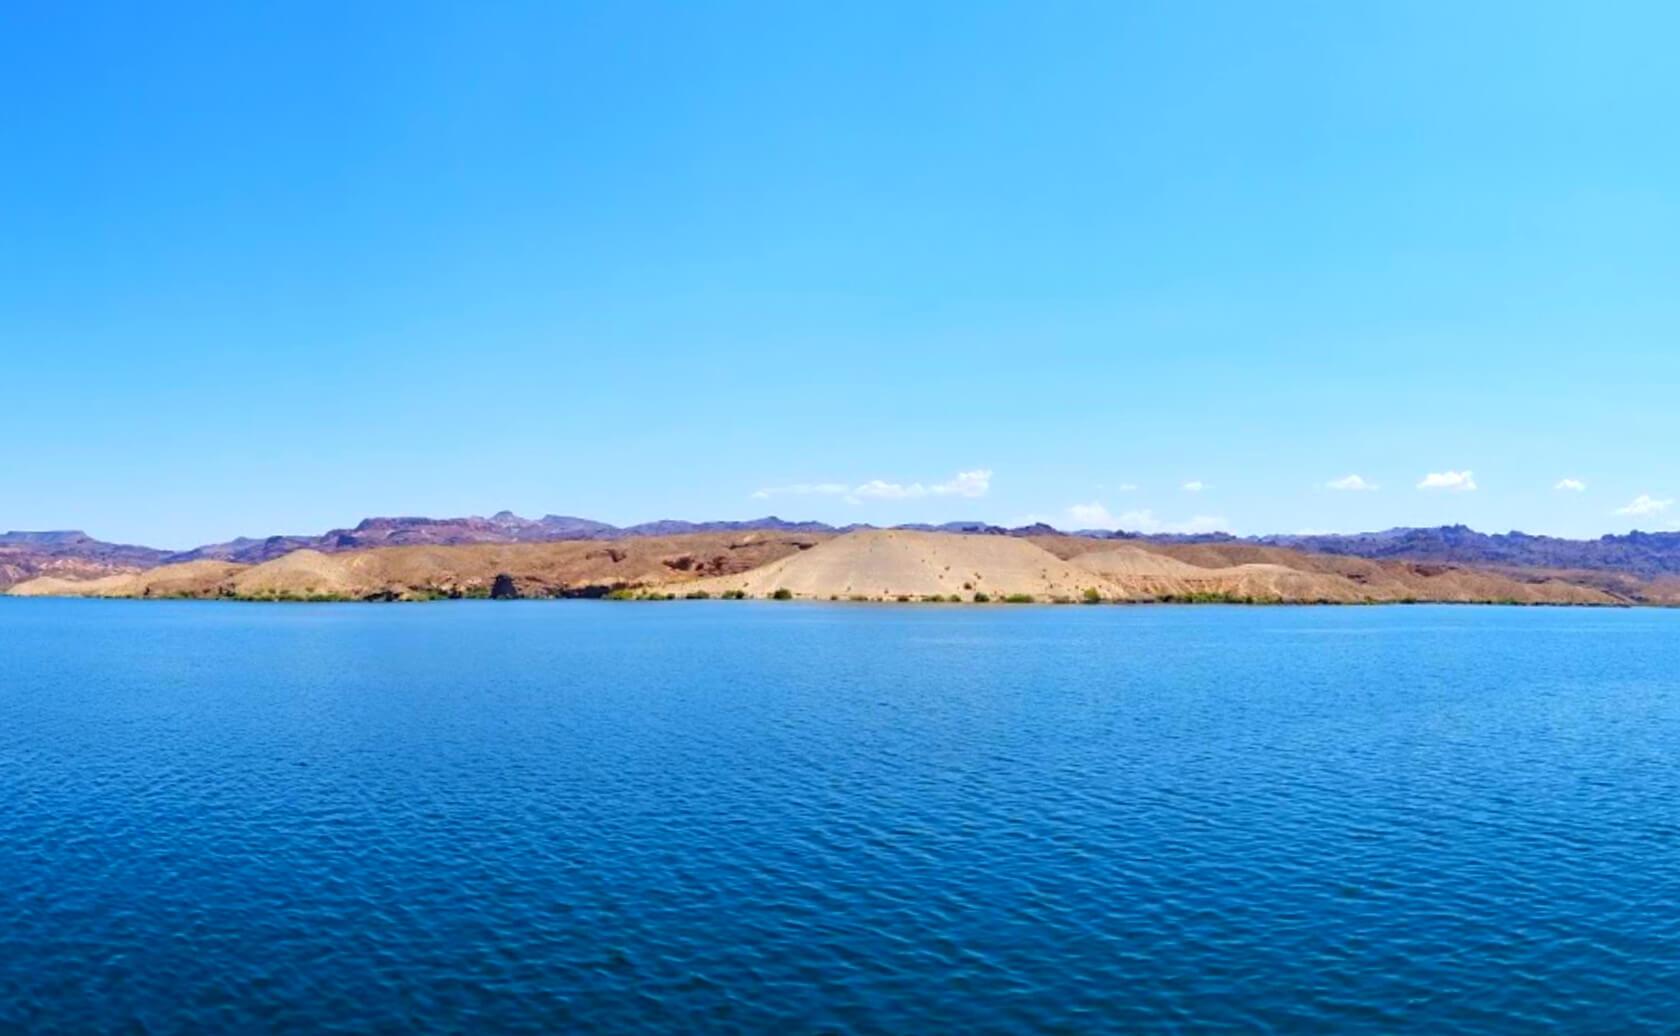 Mohave-Lake-Fishing-Guide-Report-Arizona-01